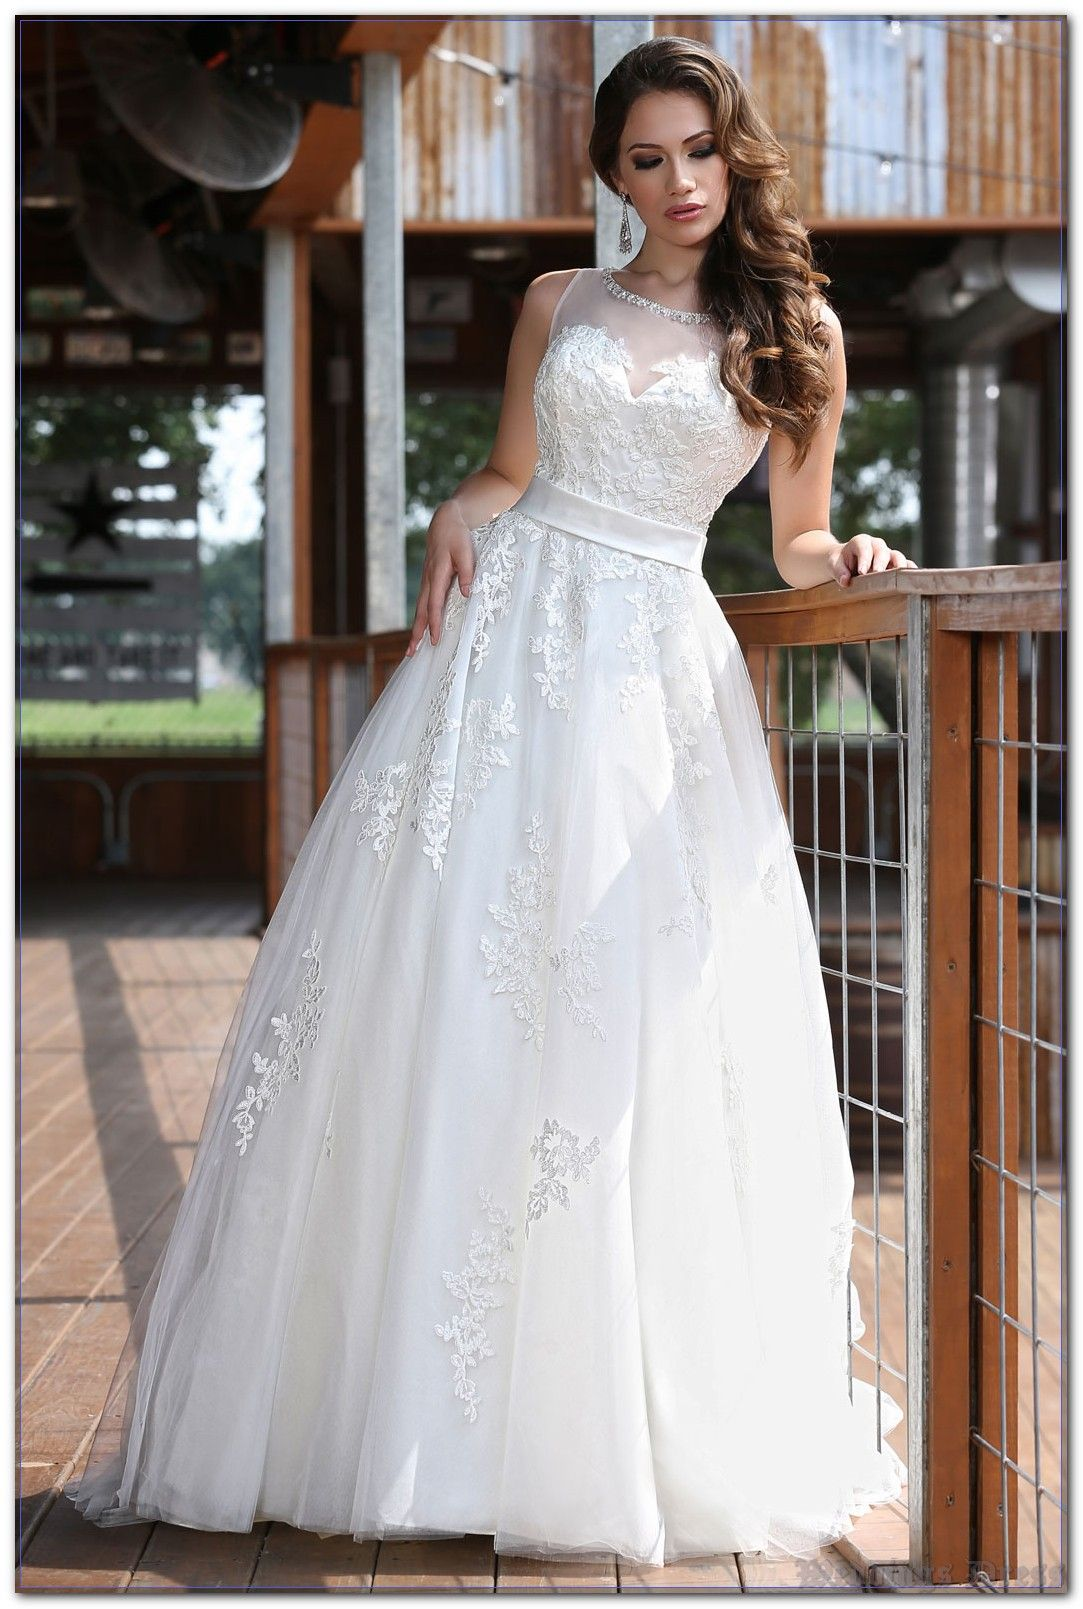 11 Methods Of Weddings Dress Domination